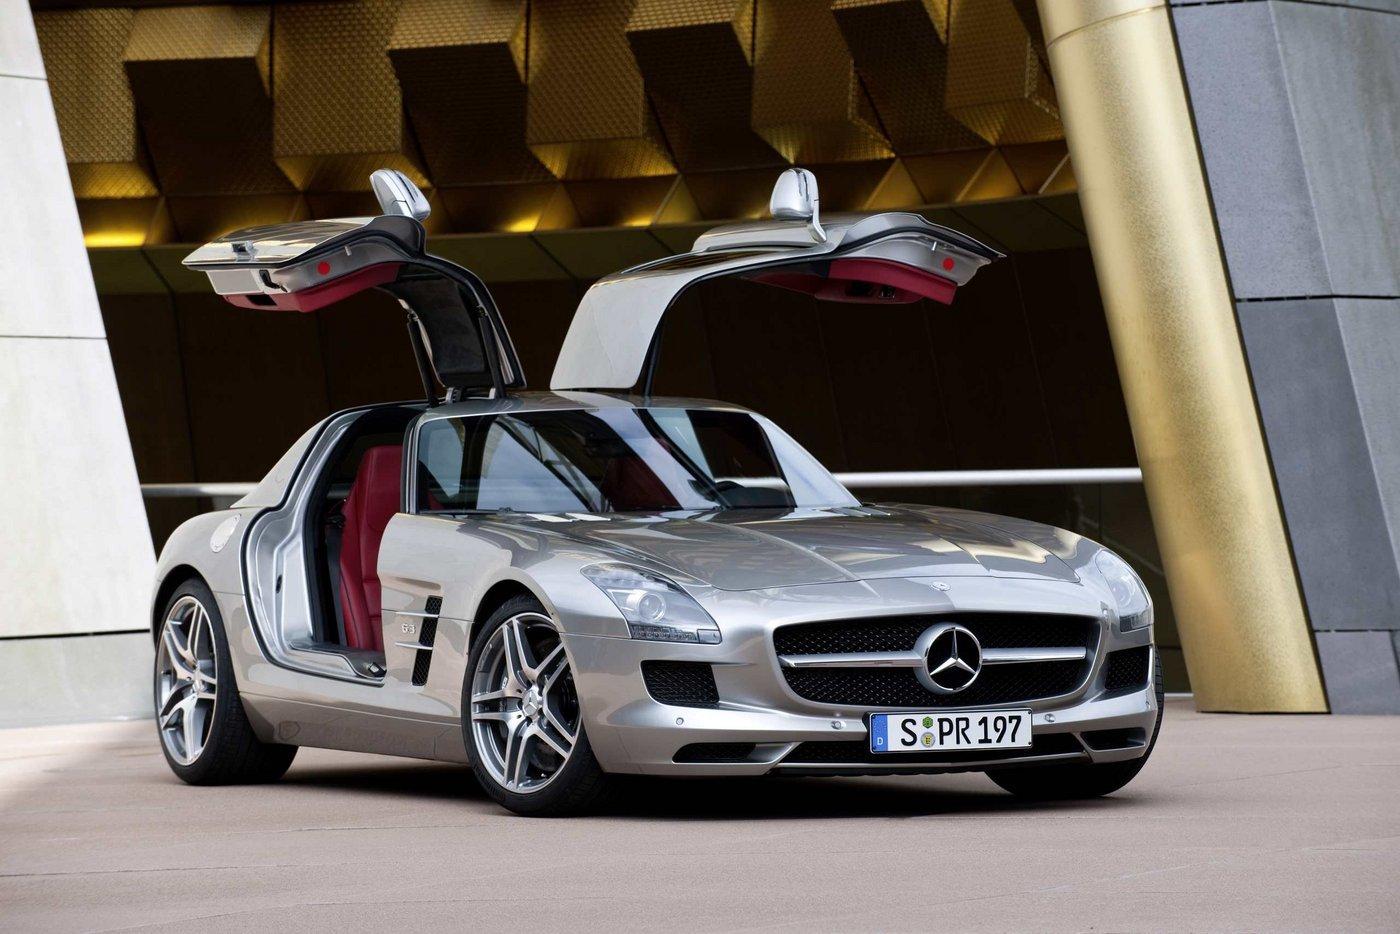 2010 mercedesbenz sls amg1 Mercedes Benz SLS 63 AMG